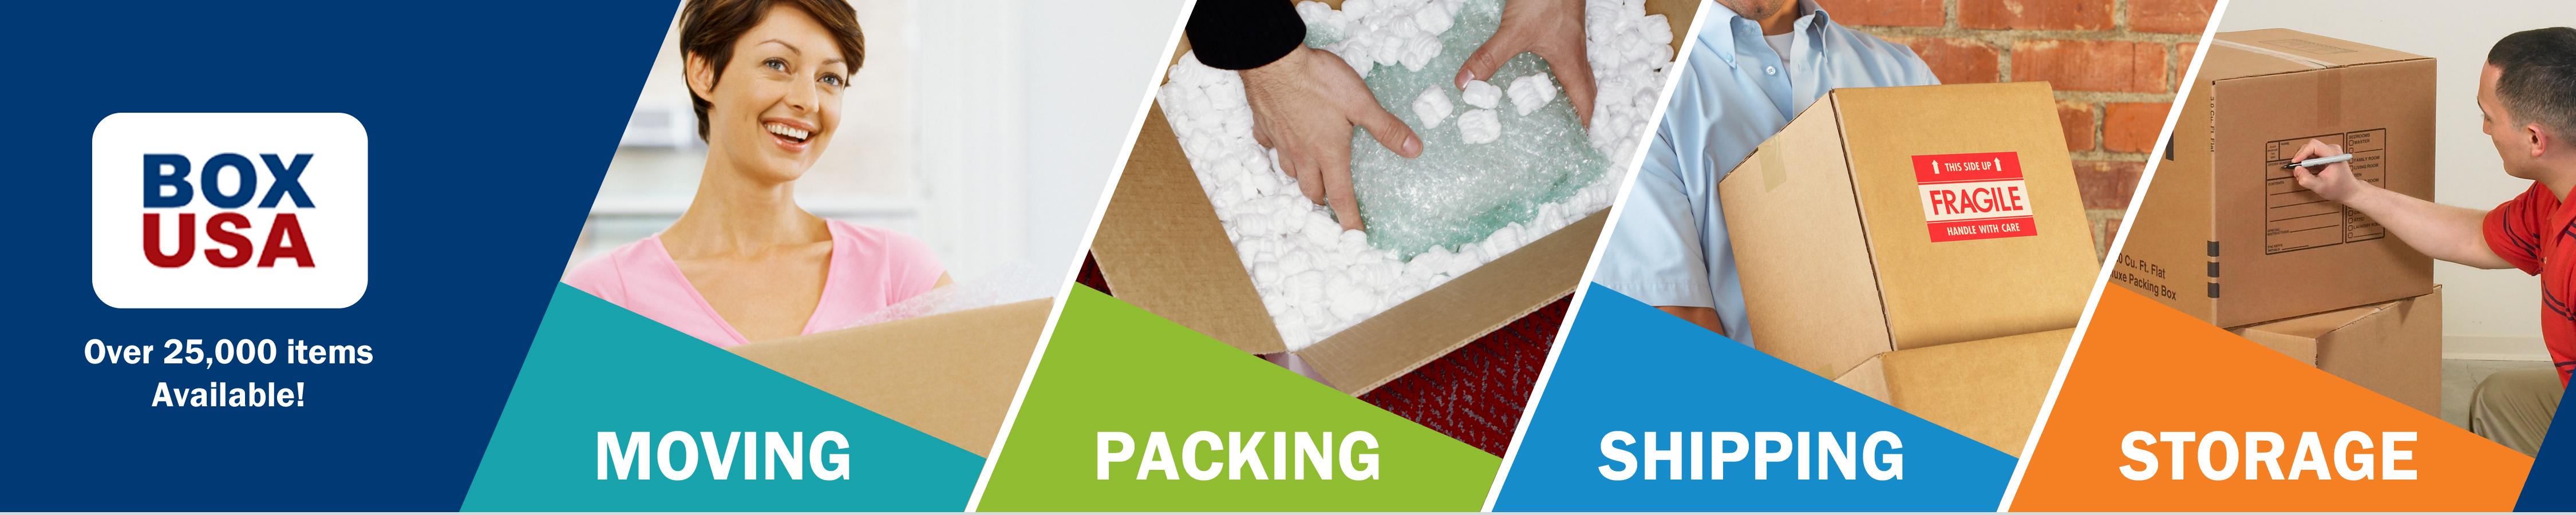 24 x 36 Pack of 160 BOX USA BNP243010 Newsprint Sheets White